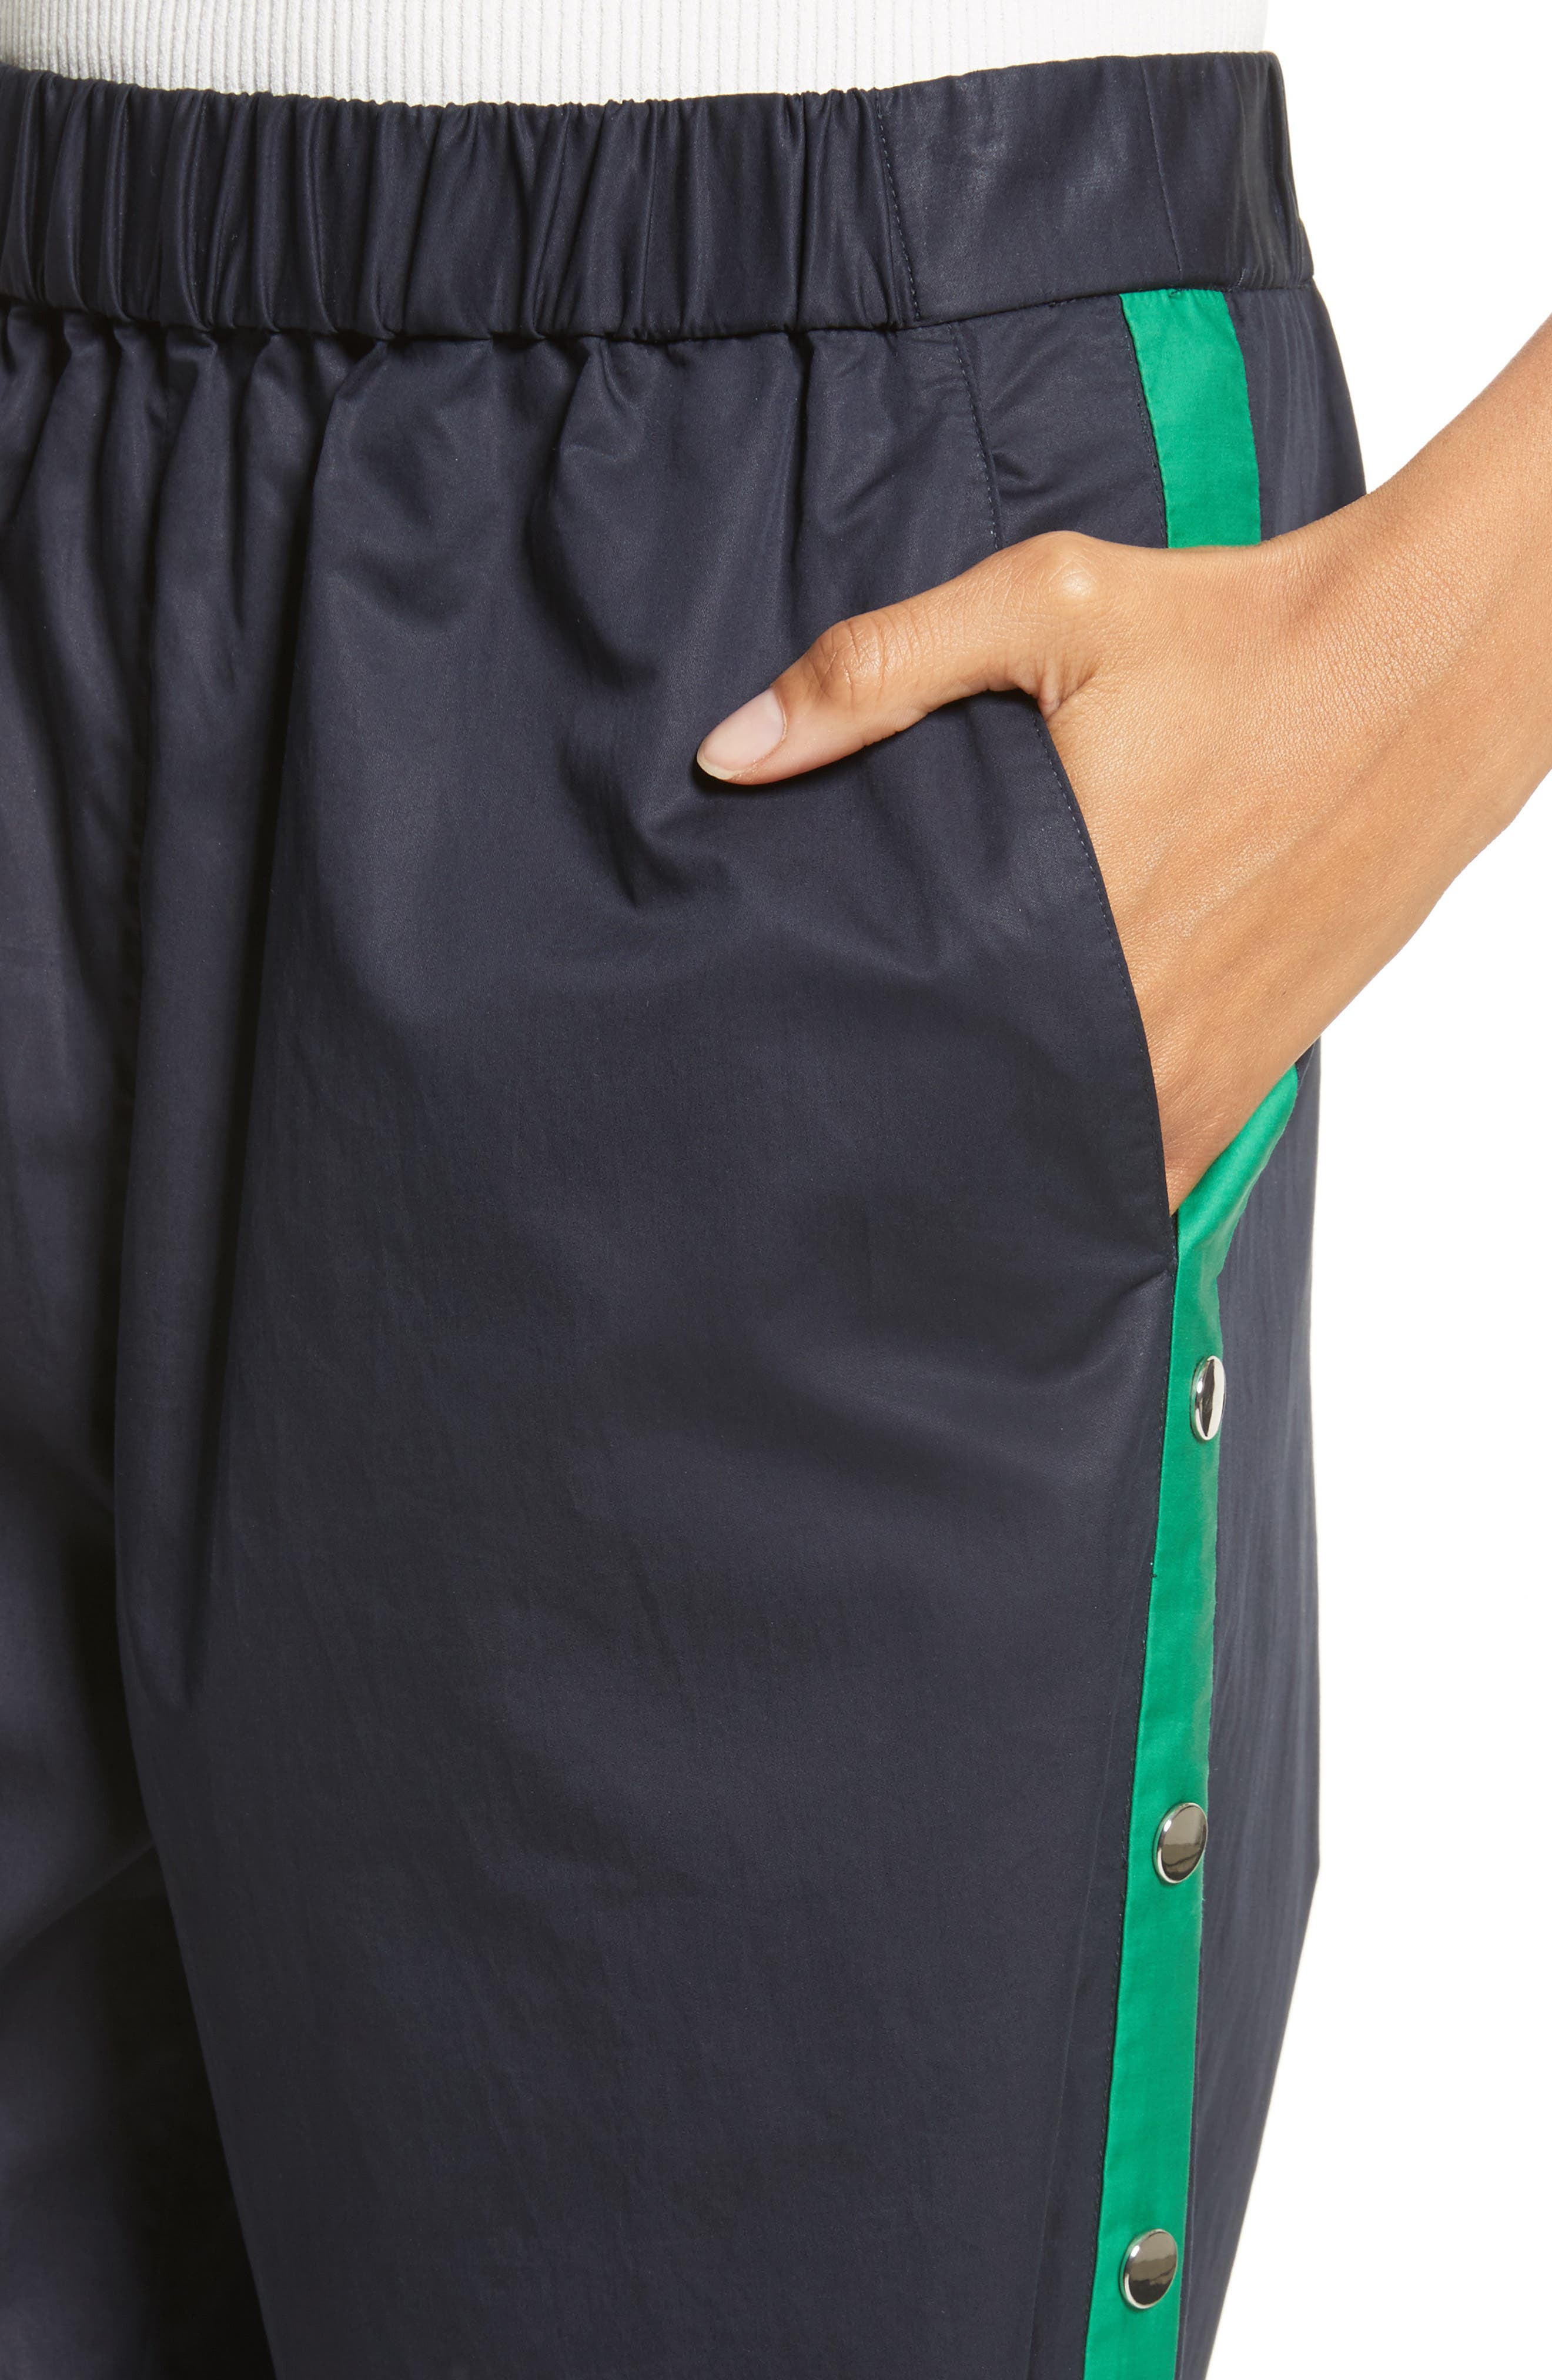 Snap Side Track Pants,                             Alternate thumbnail 4, color,                             Navy/ Green Multi